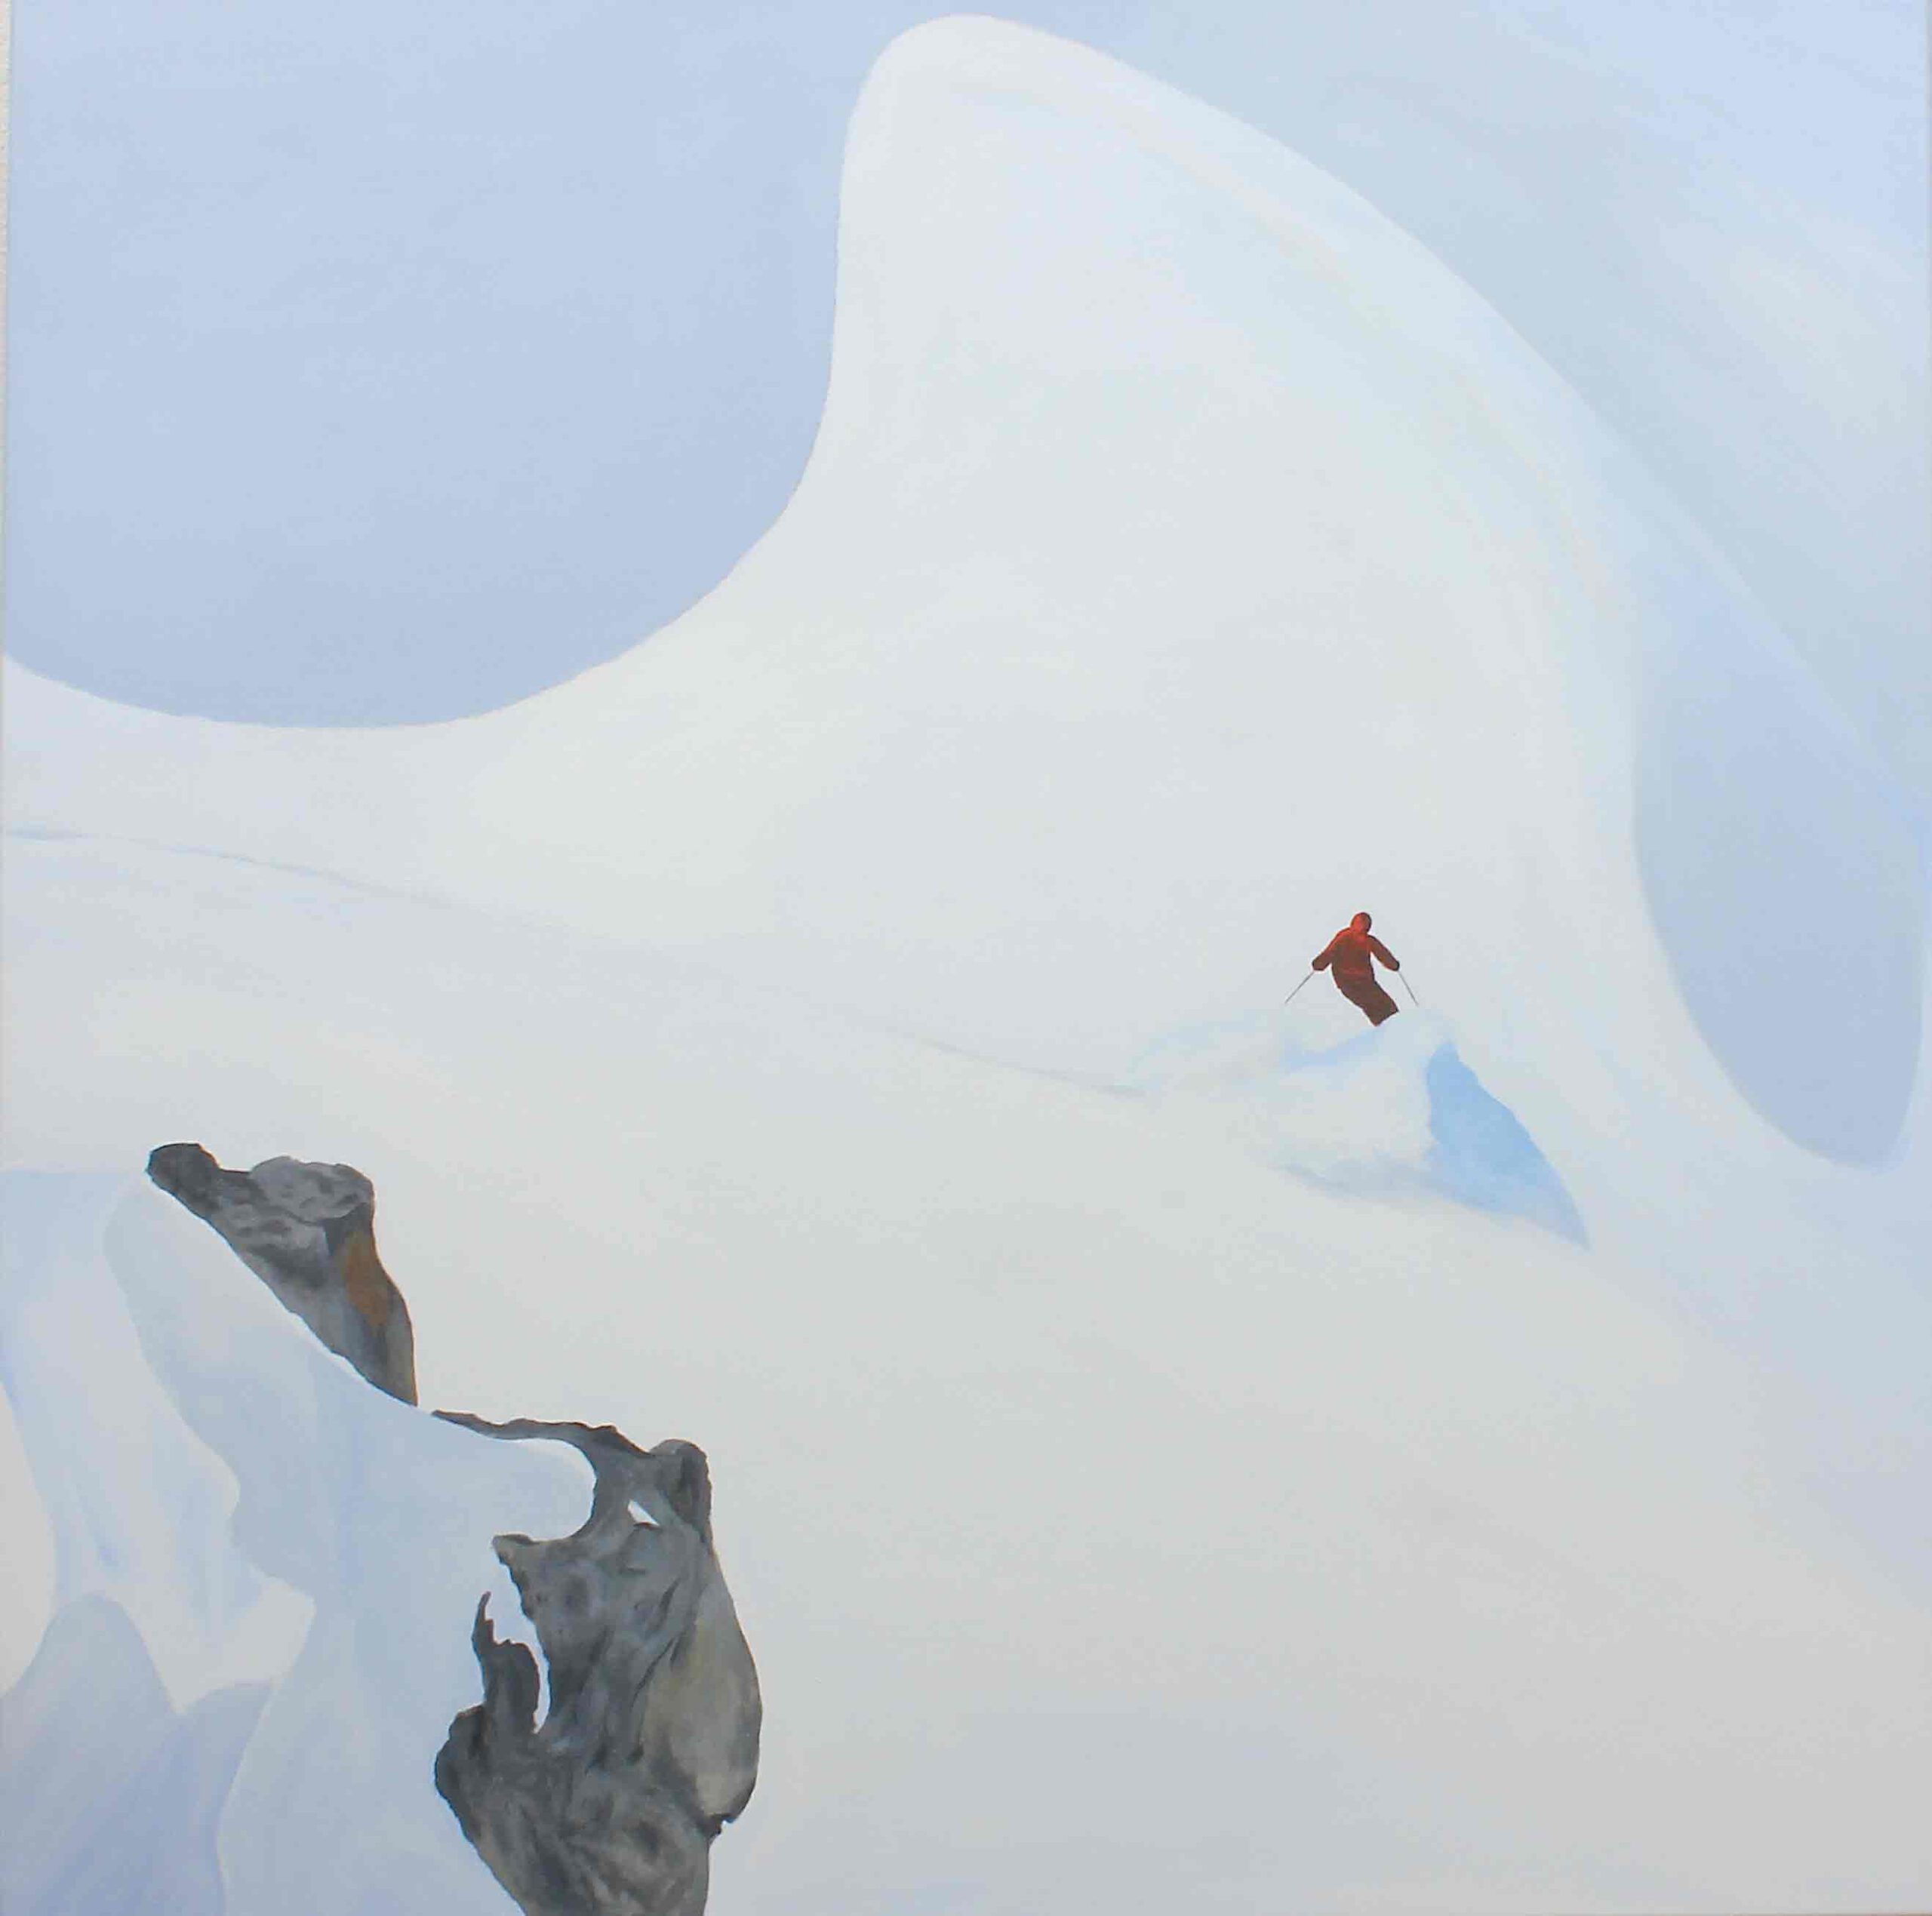 """Am Hang"" 95 x 95 cm, Acryl auf Leinwand, Felix Rieger 2018"